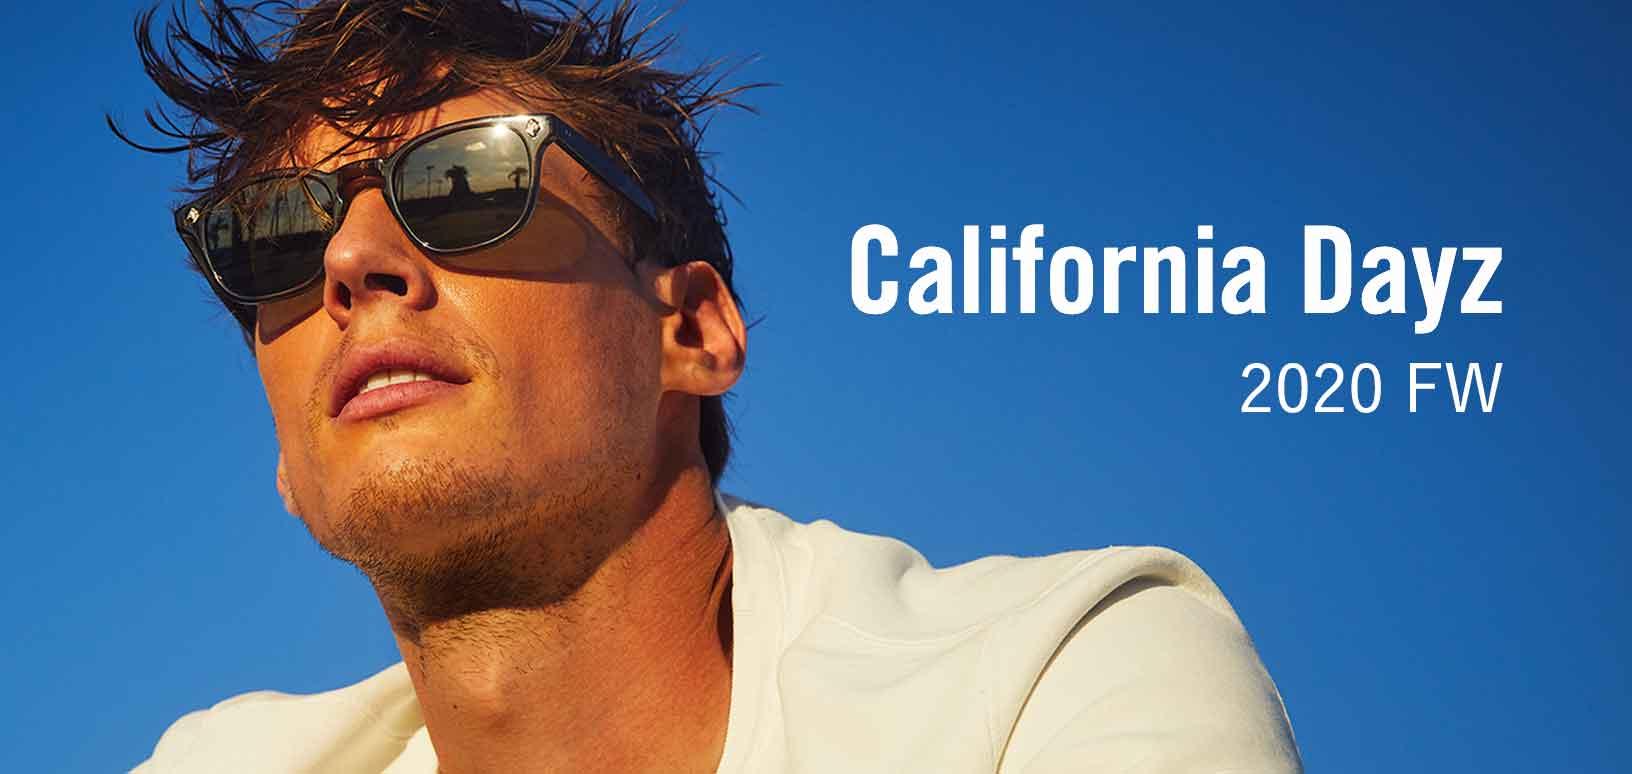 California Dayz 2020 FW